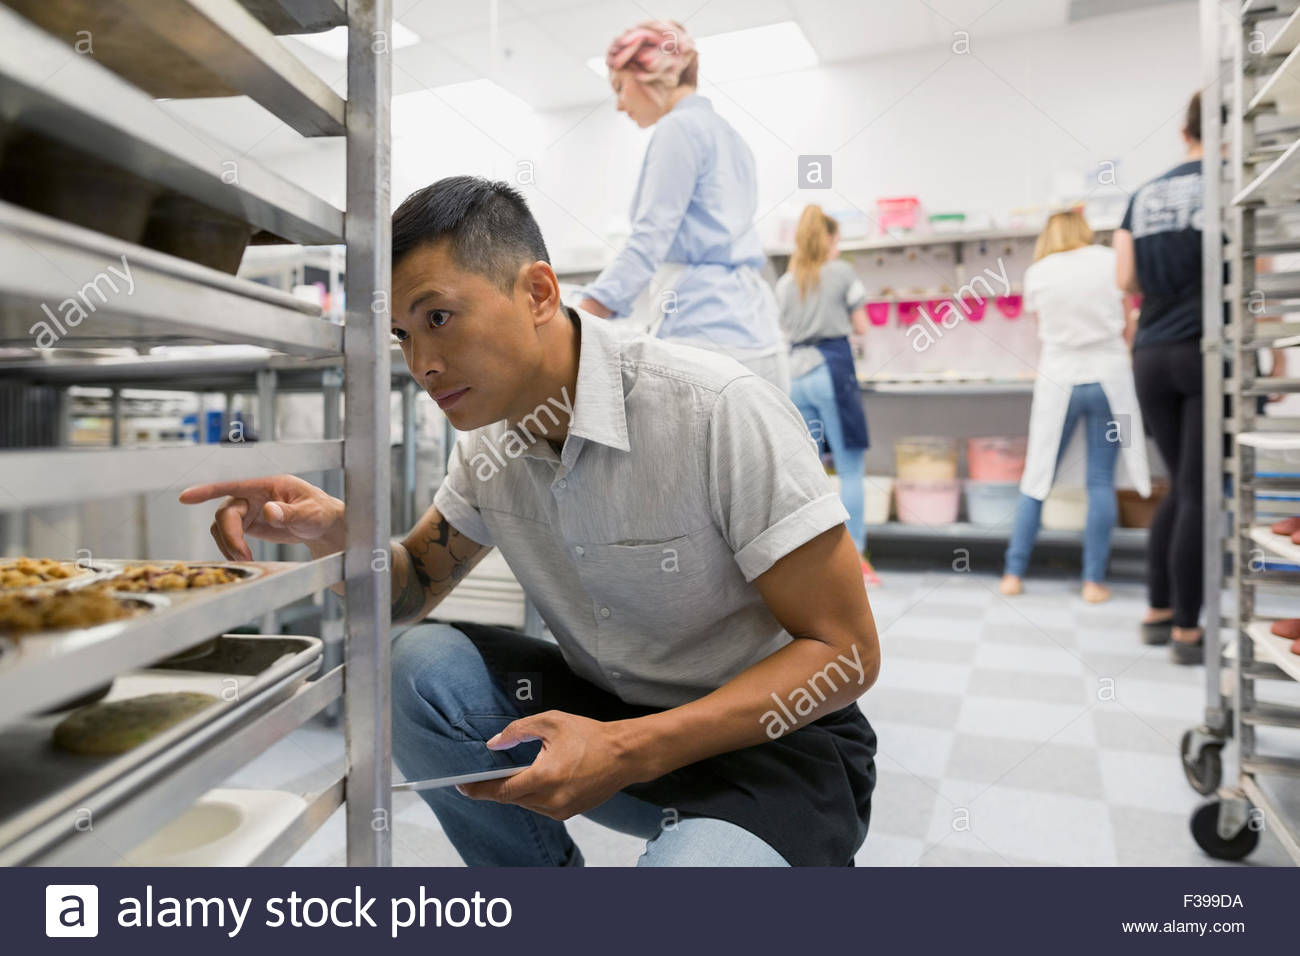 Chef pastelero contando magdalenas en racks cocina comercial Imagen De Stock